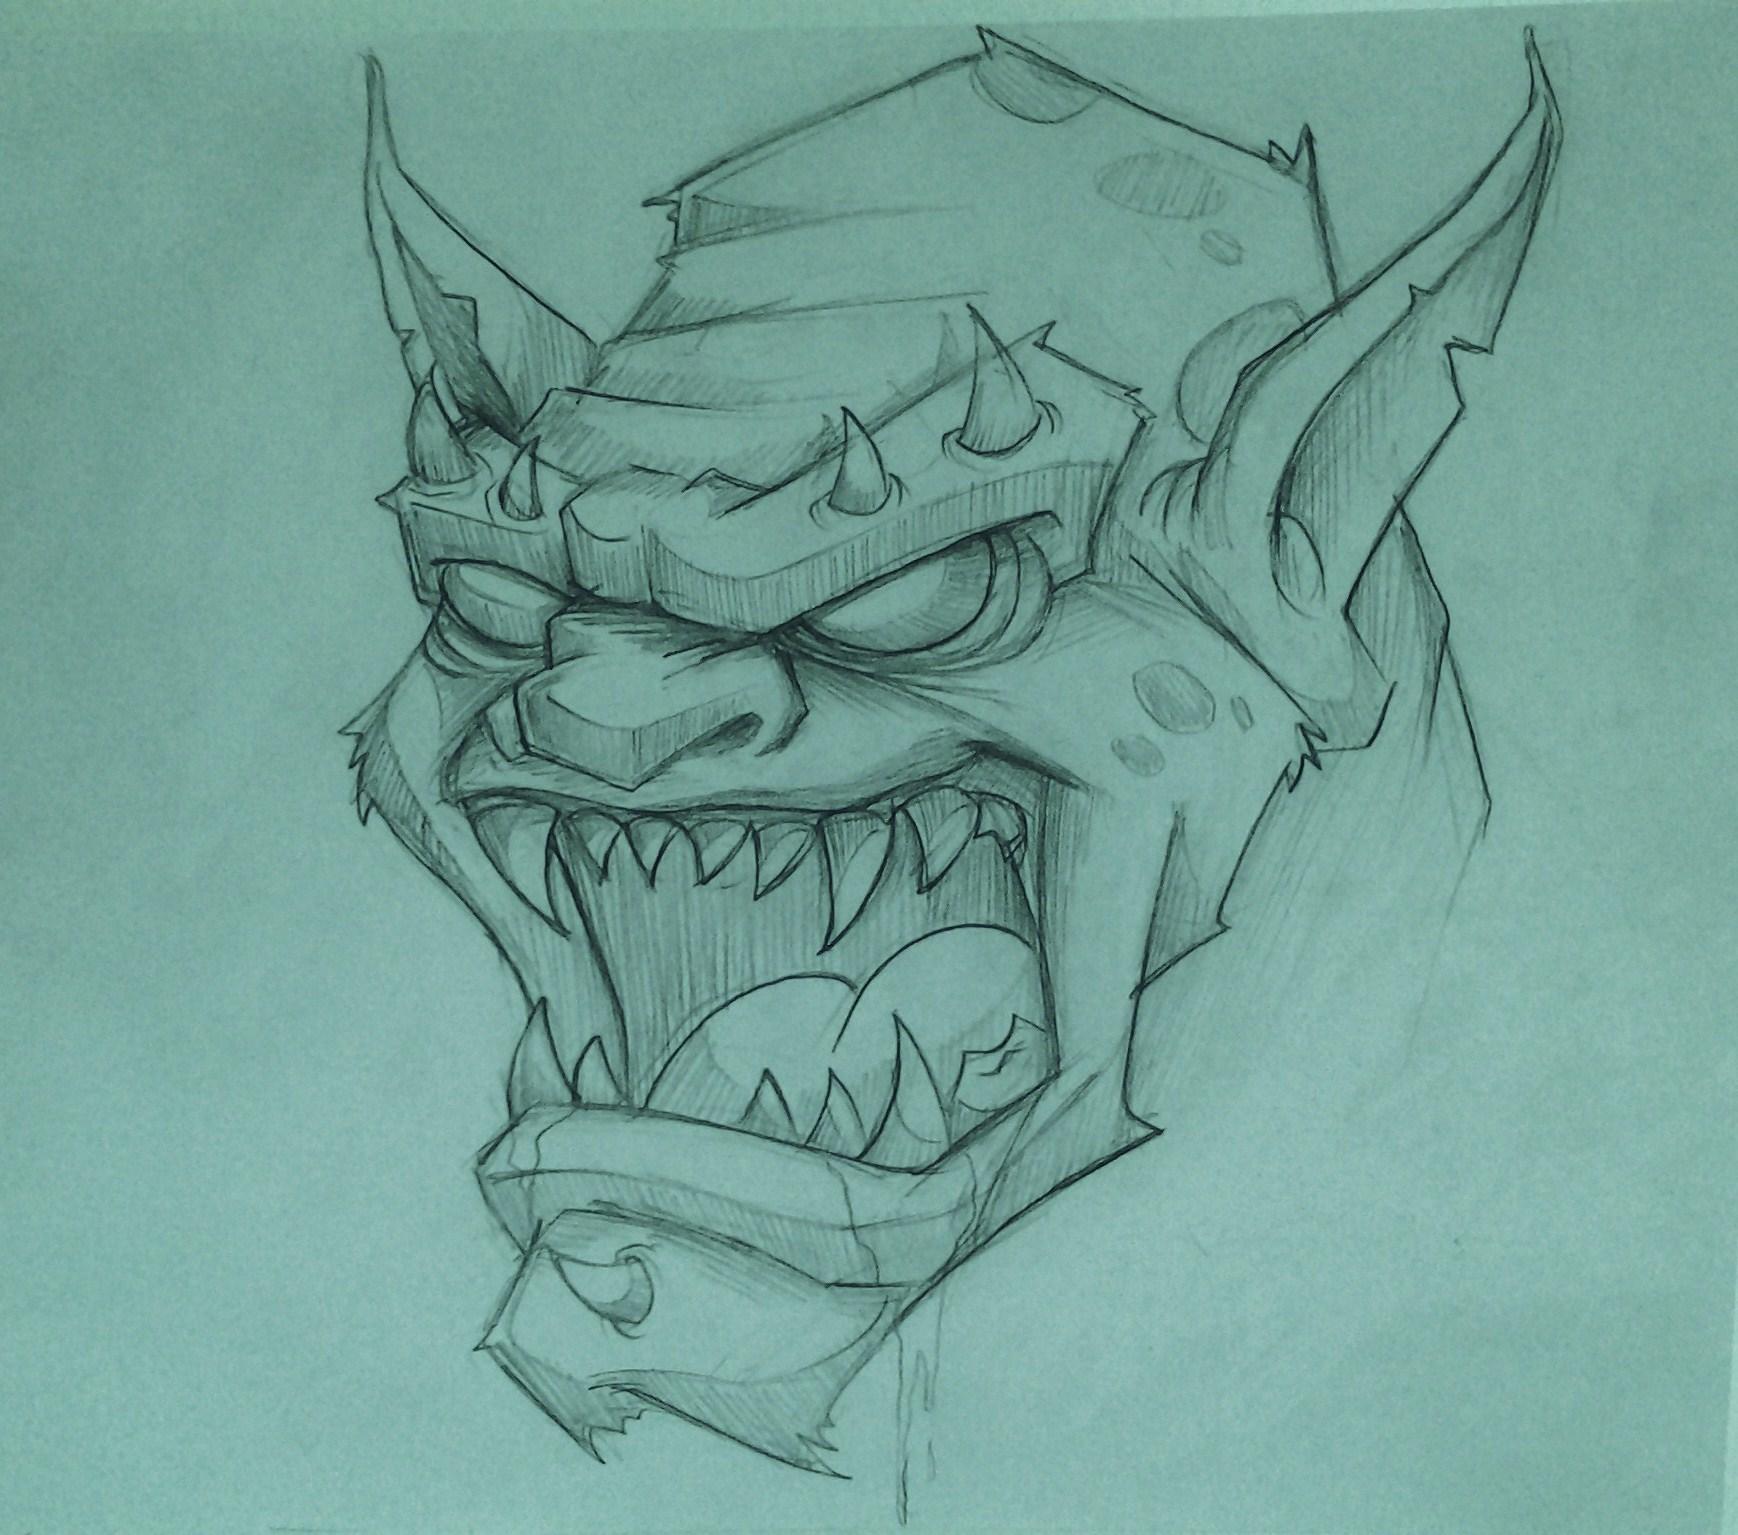 Monster Sketching for Tijuana Flats